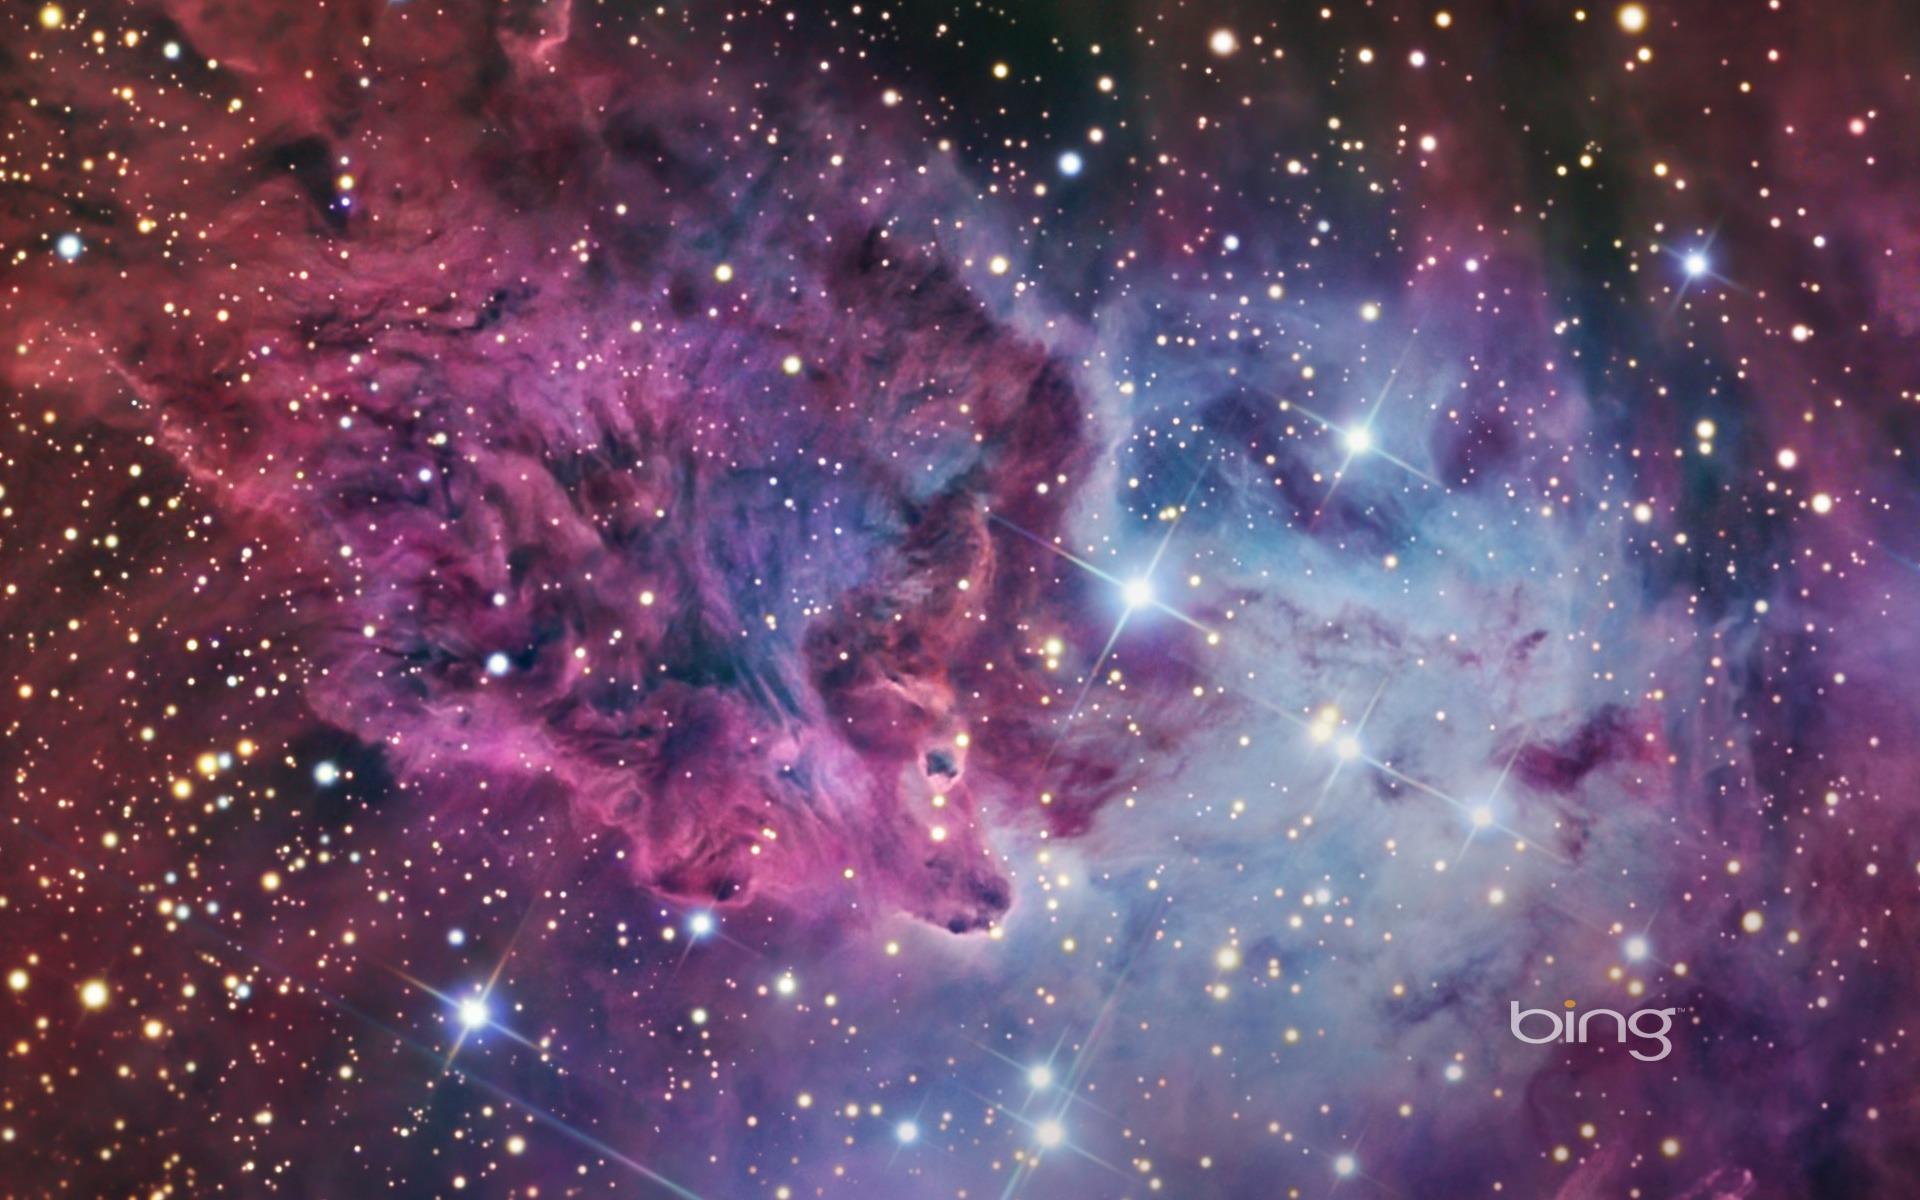 A large HII nebula-Bing Wallpaper-1920x1200 Download ...